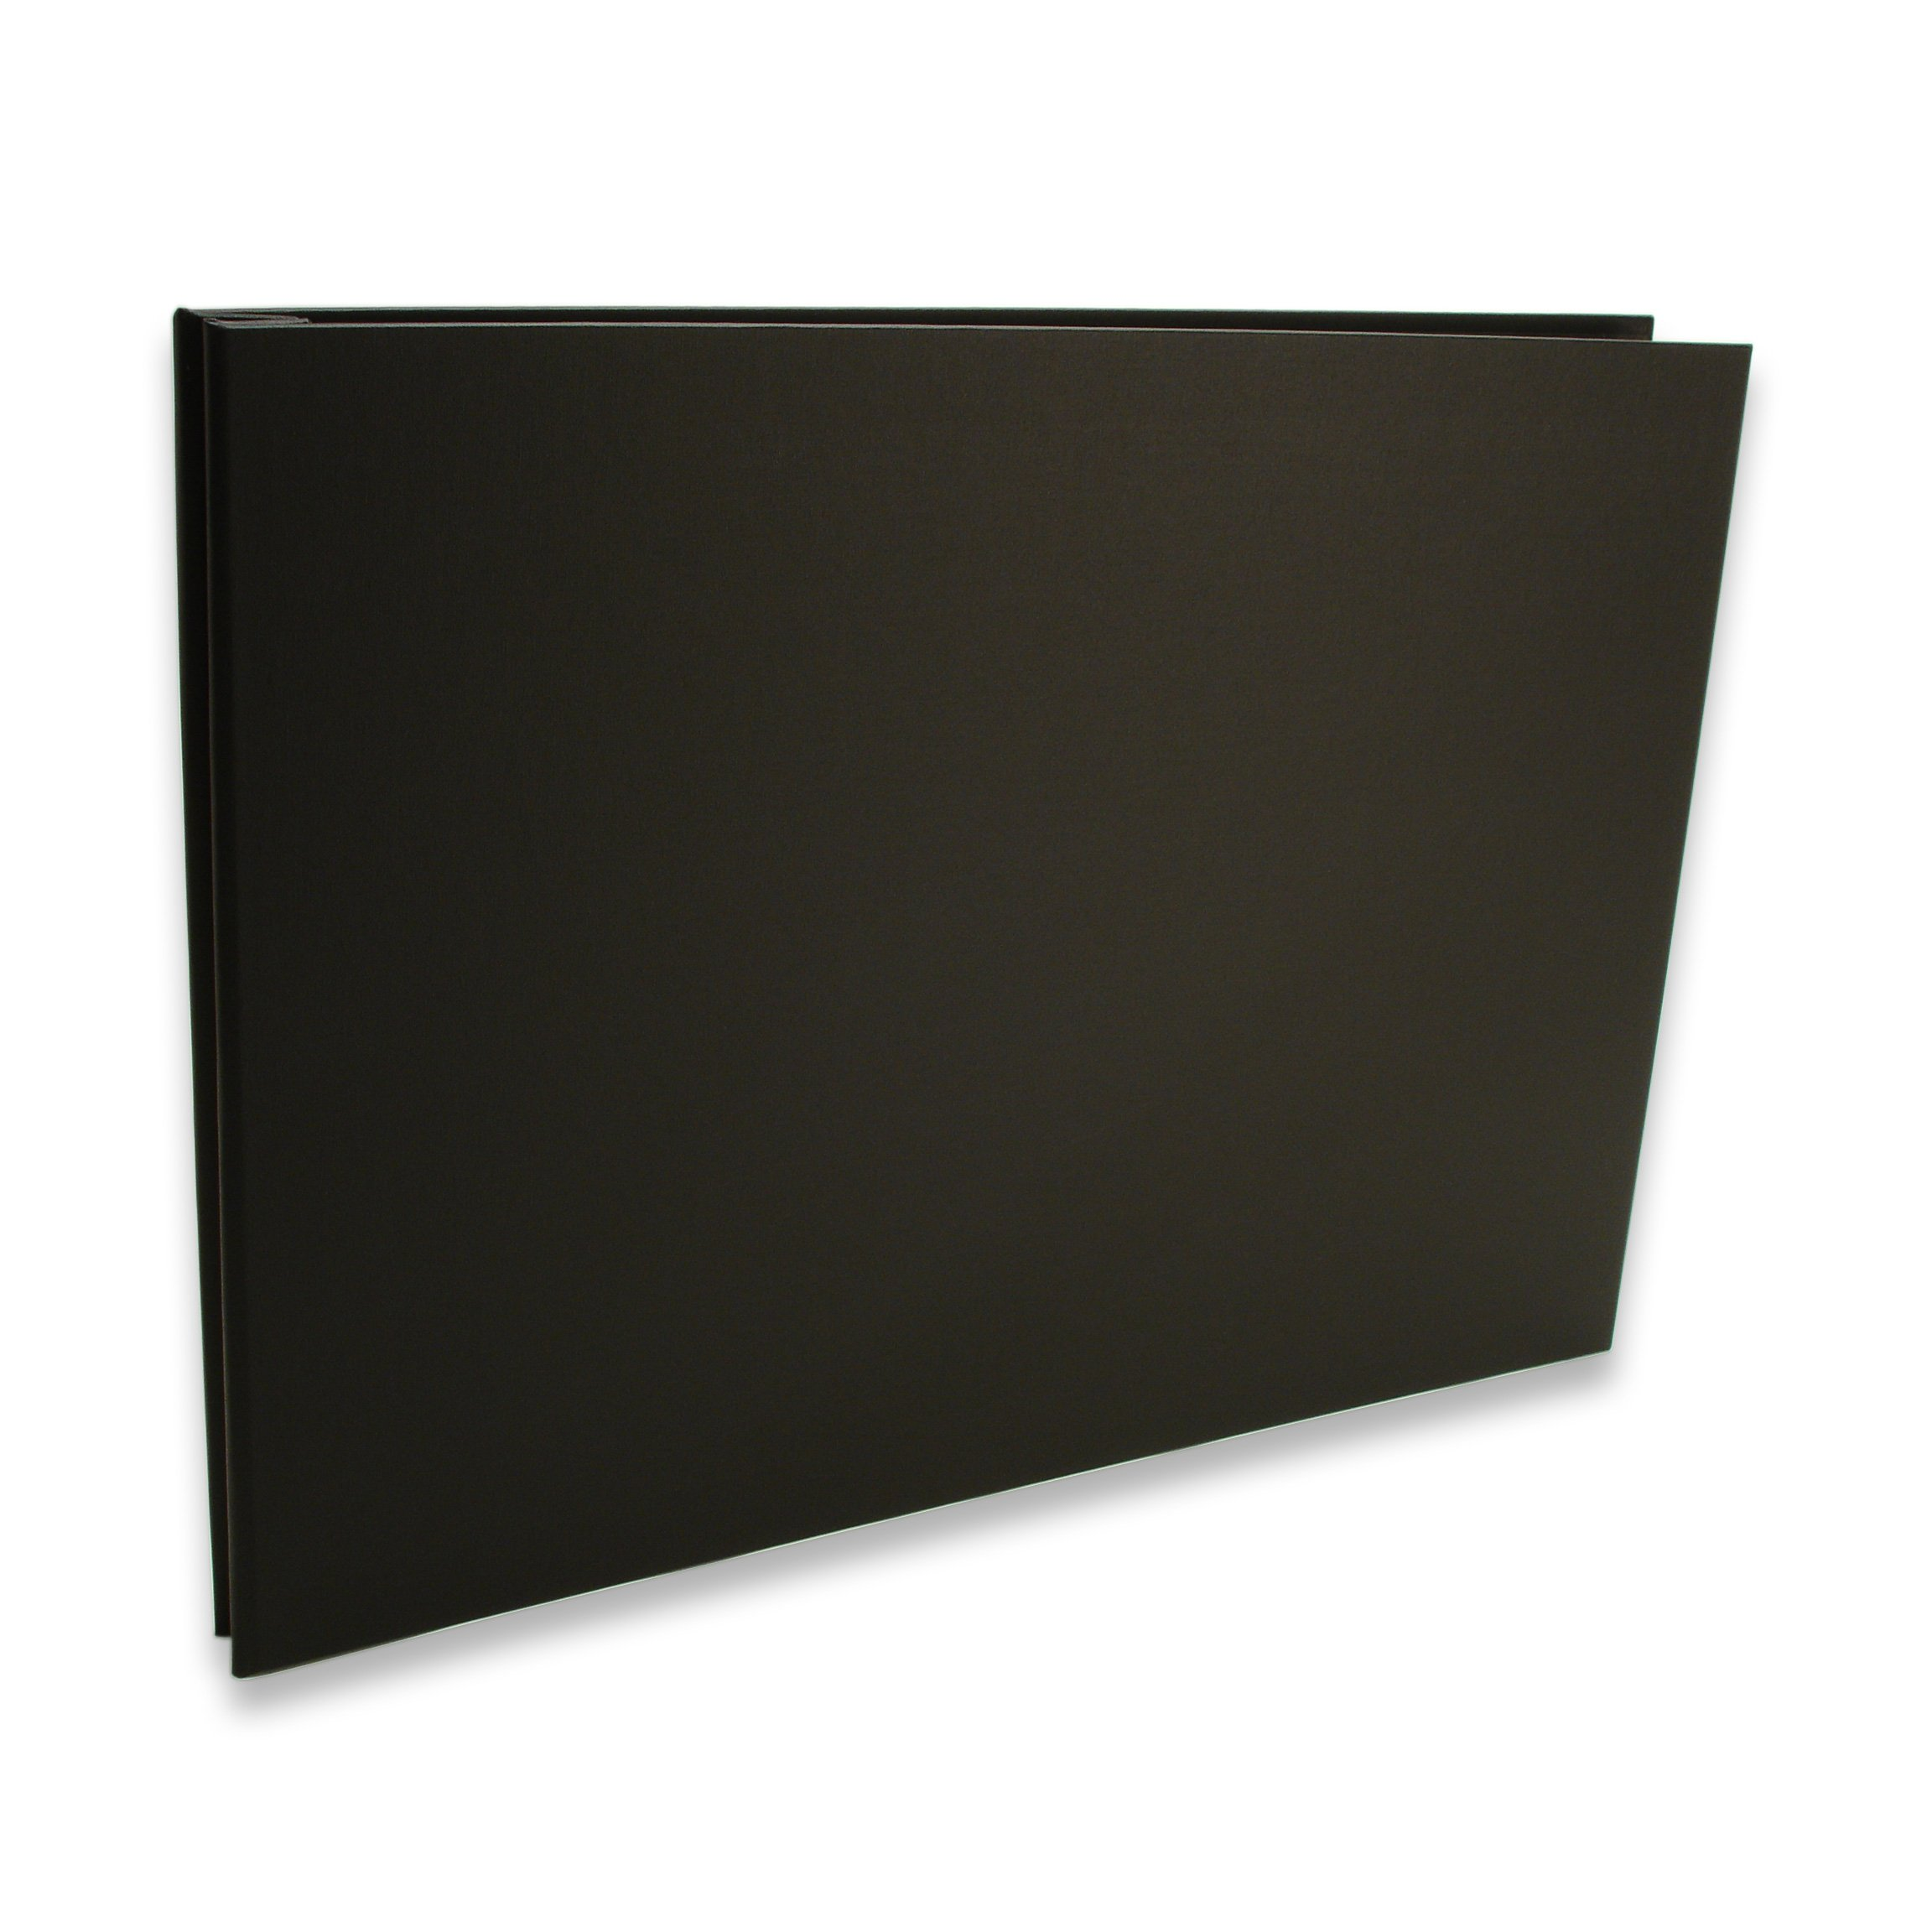 Pina Zangaro Bex Black Screwpost Binder, 11x14 Landscape Orientation (34450)